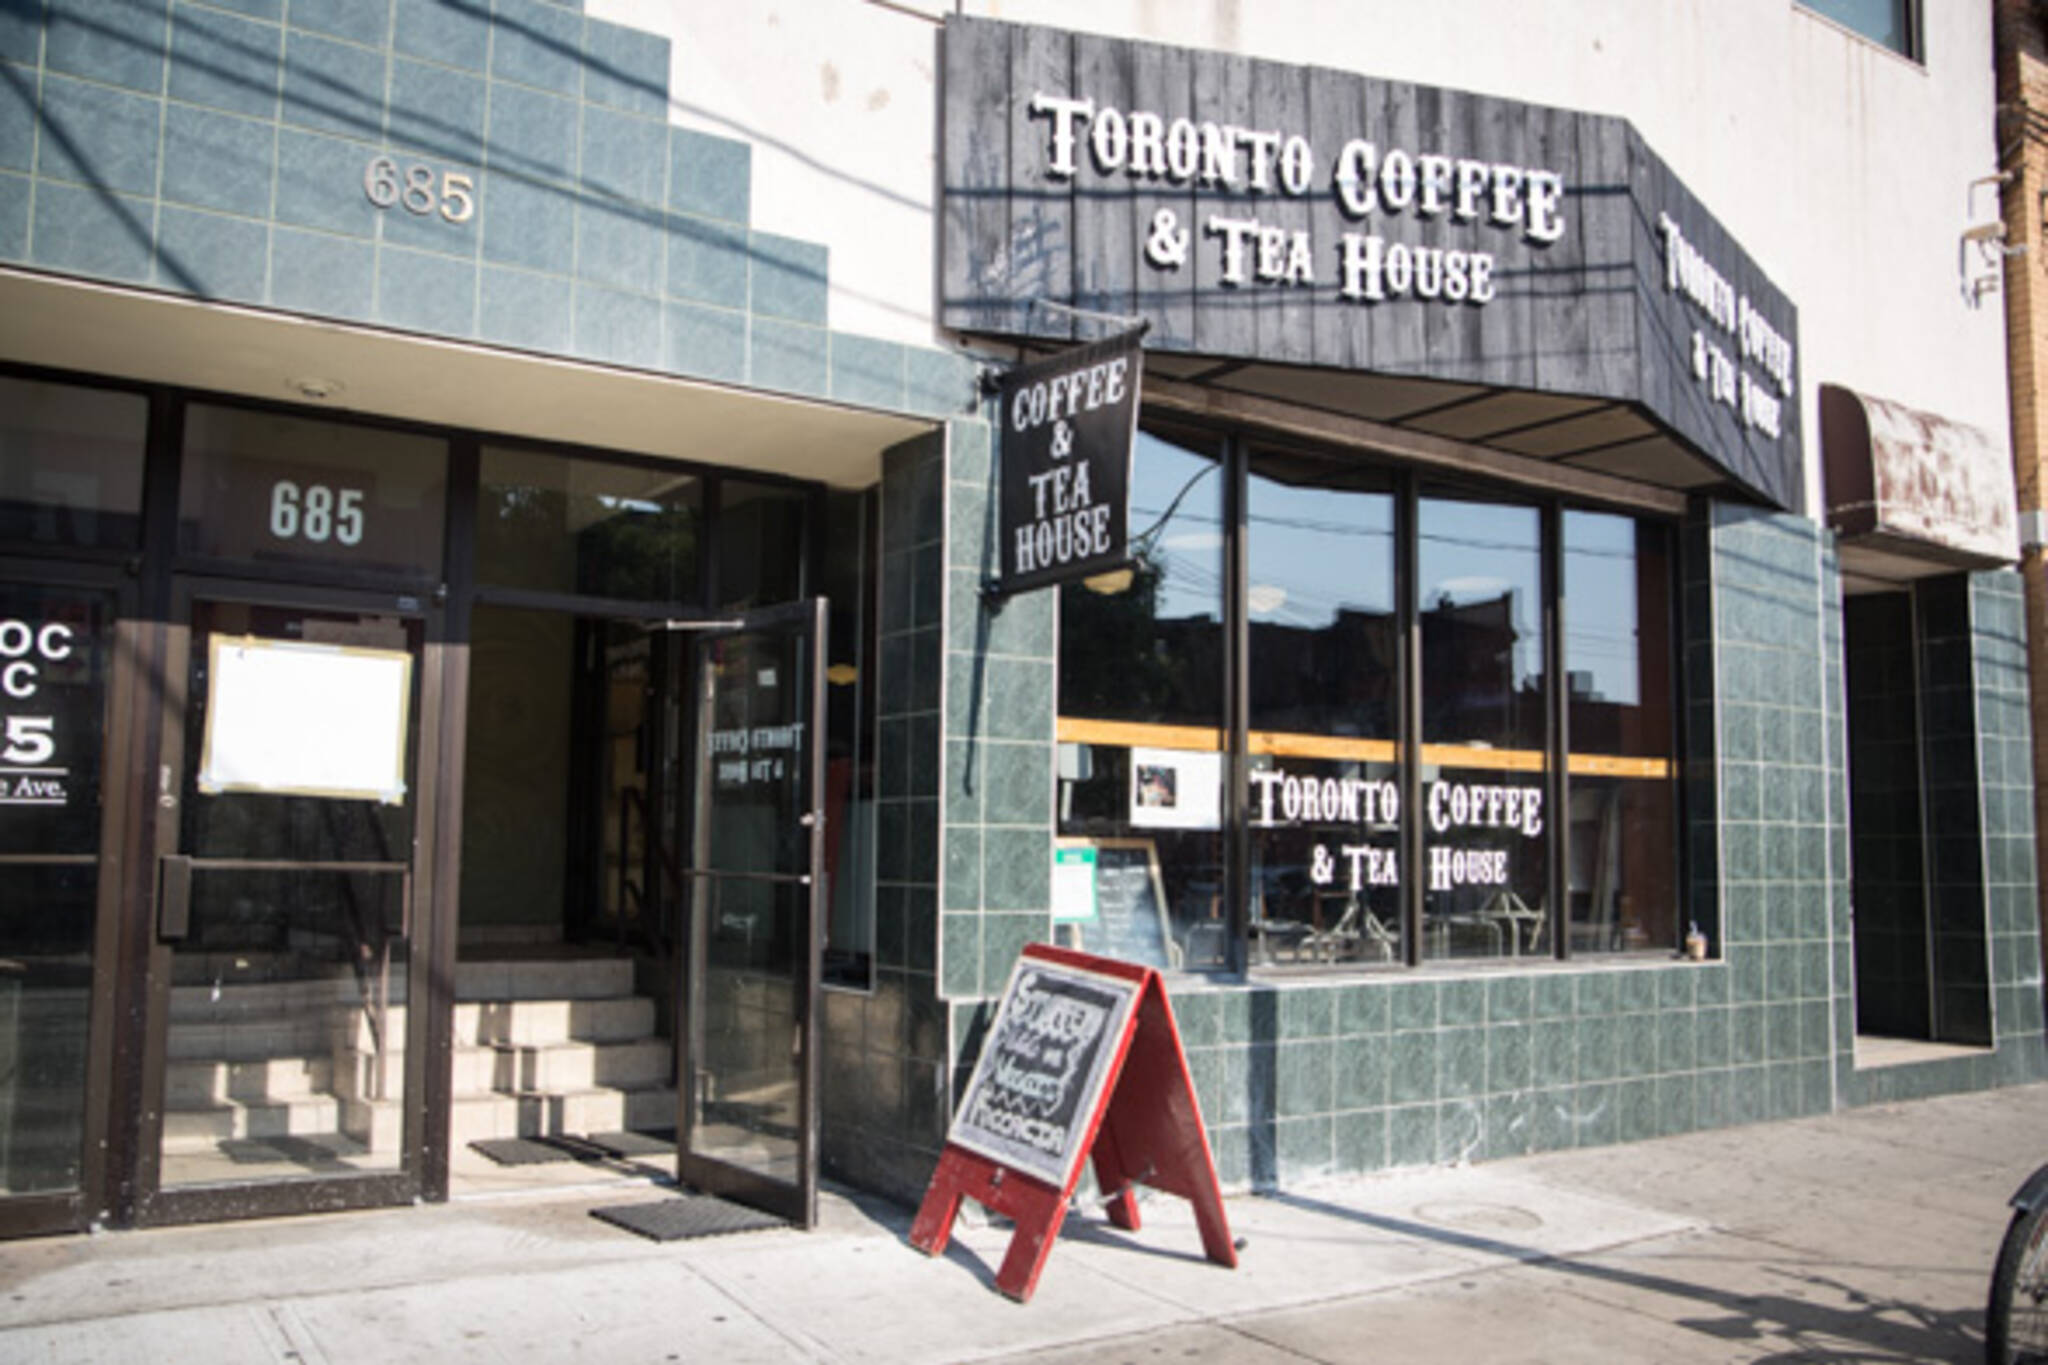 toronto coffee and tea house toronto